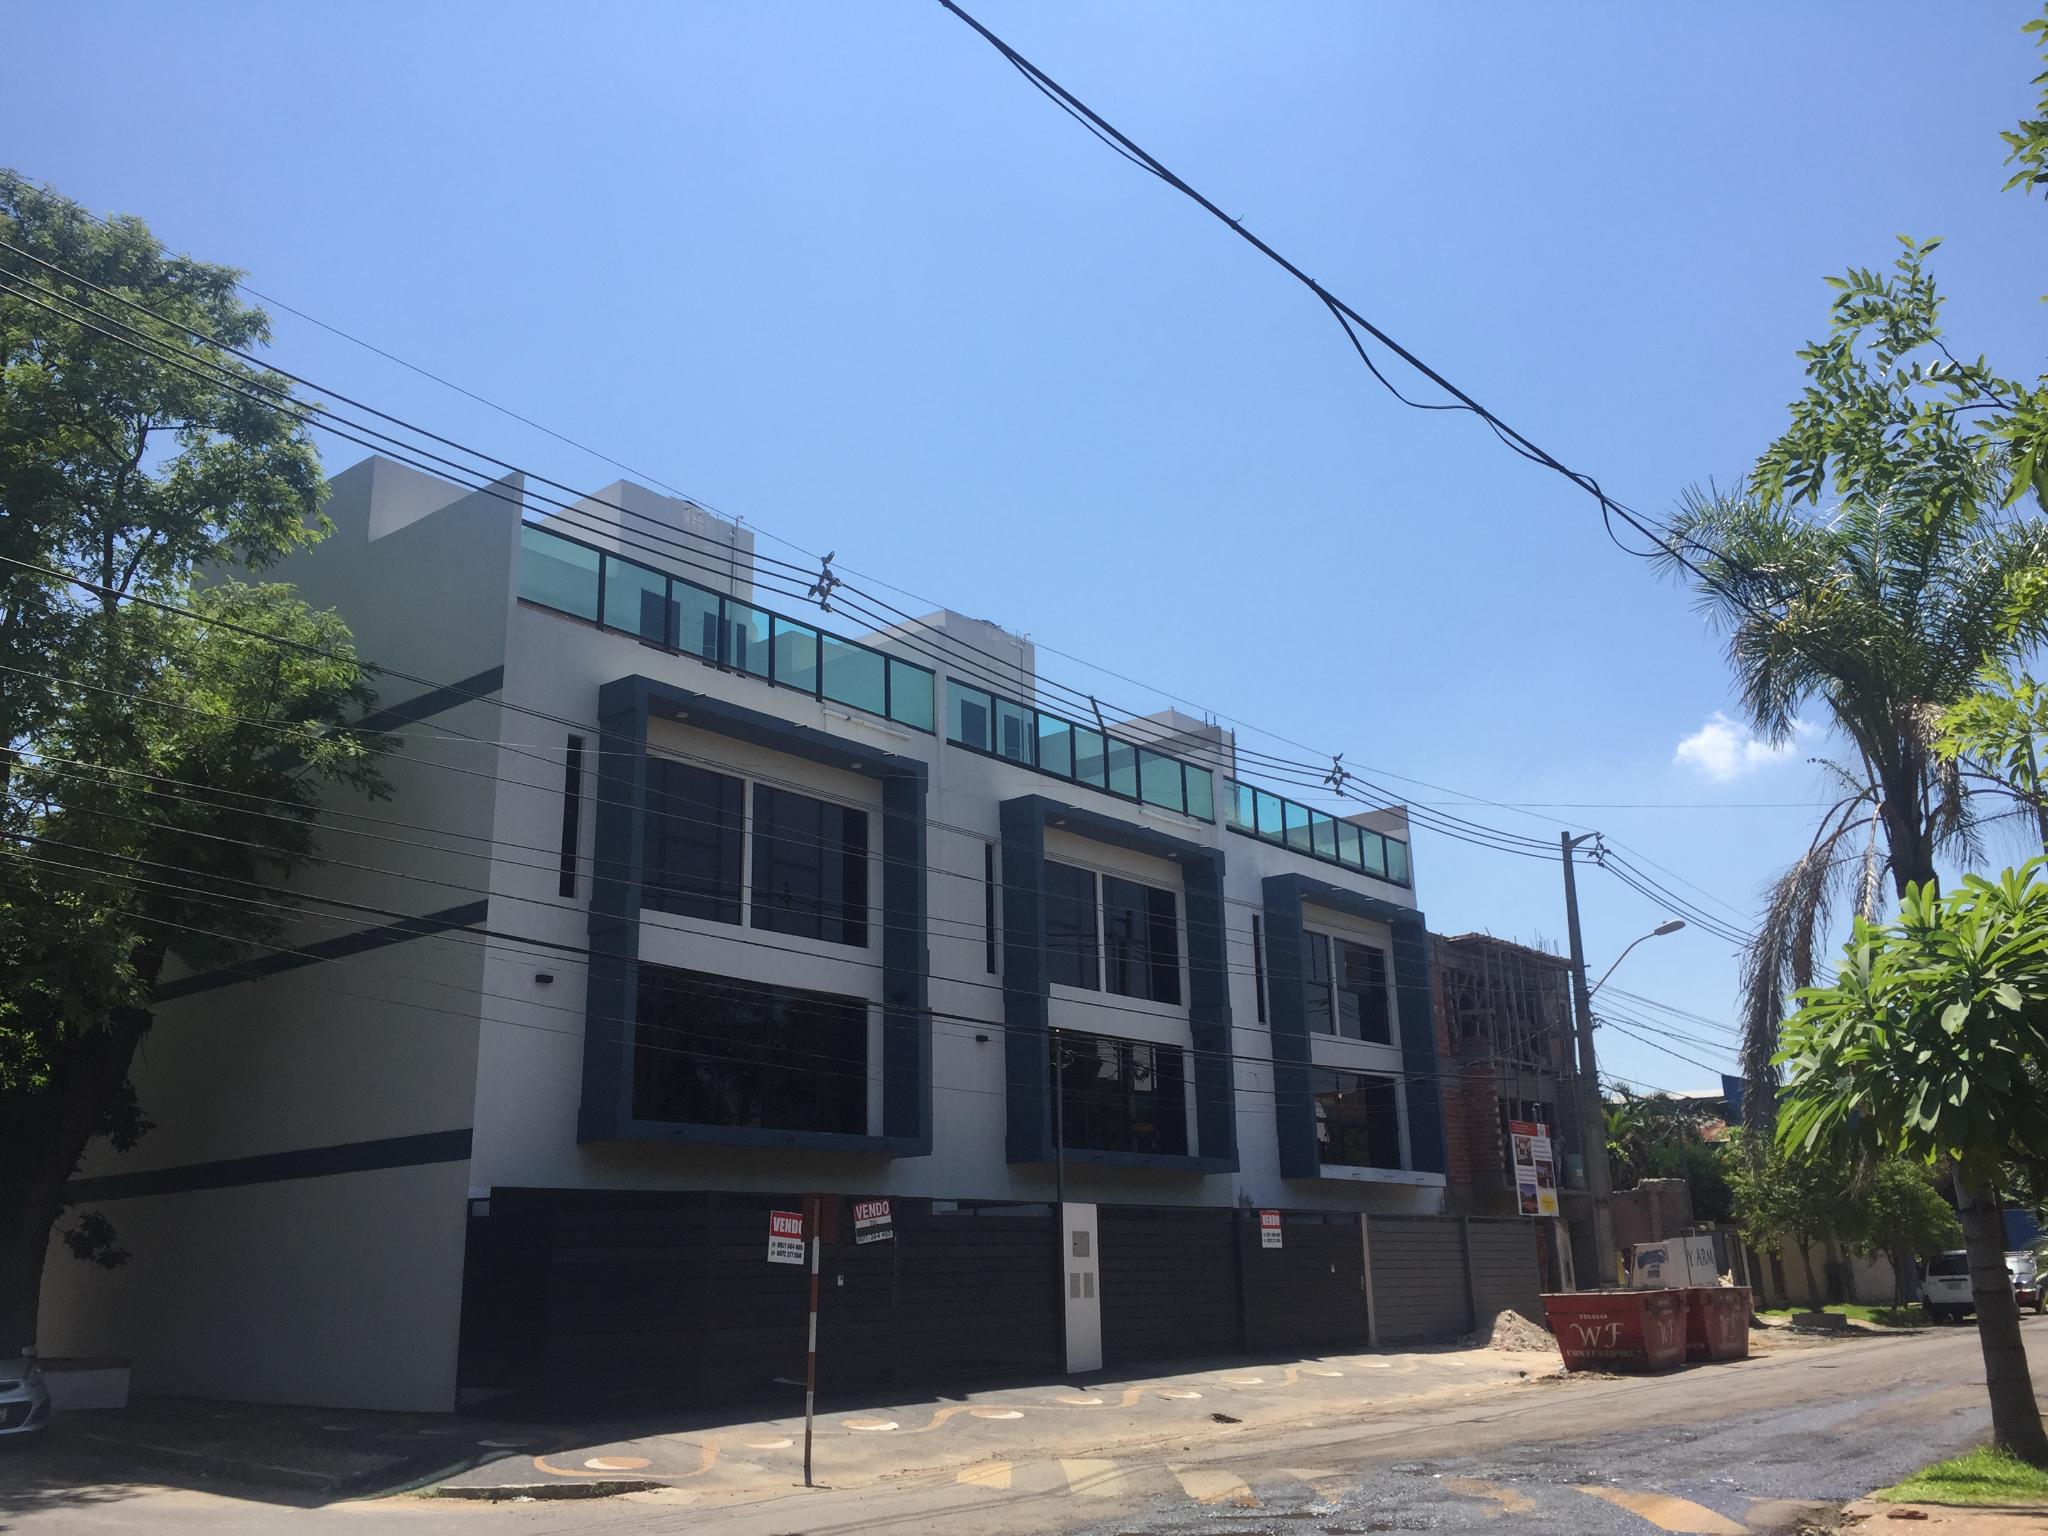 Proyecto Alas Paraguayas - Casa Unifamiliar De 3 Pisos